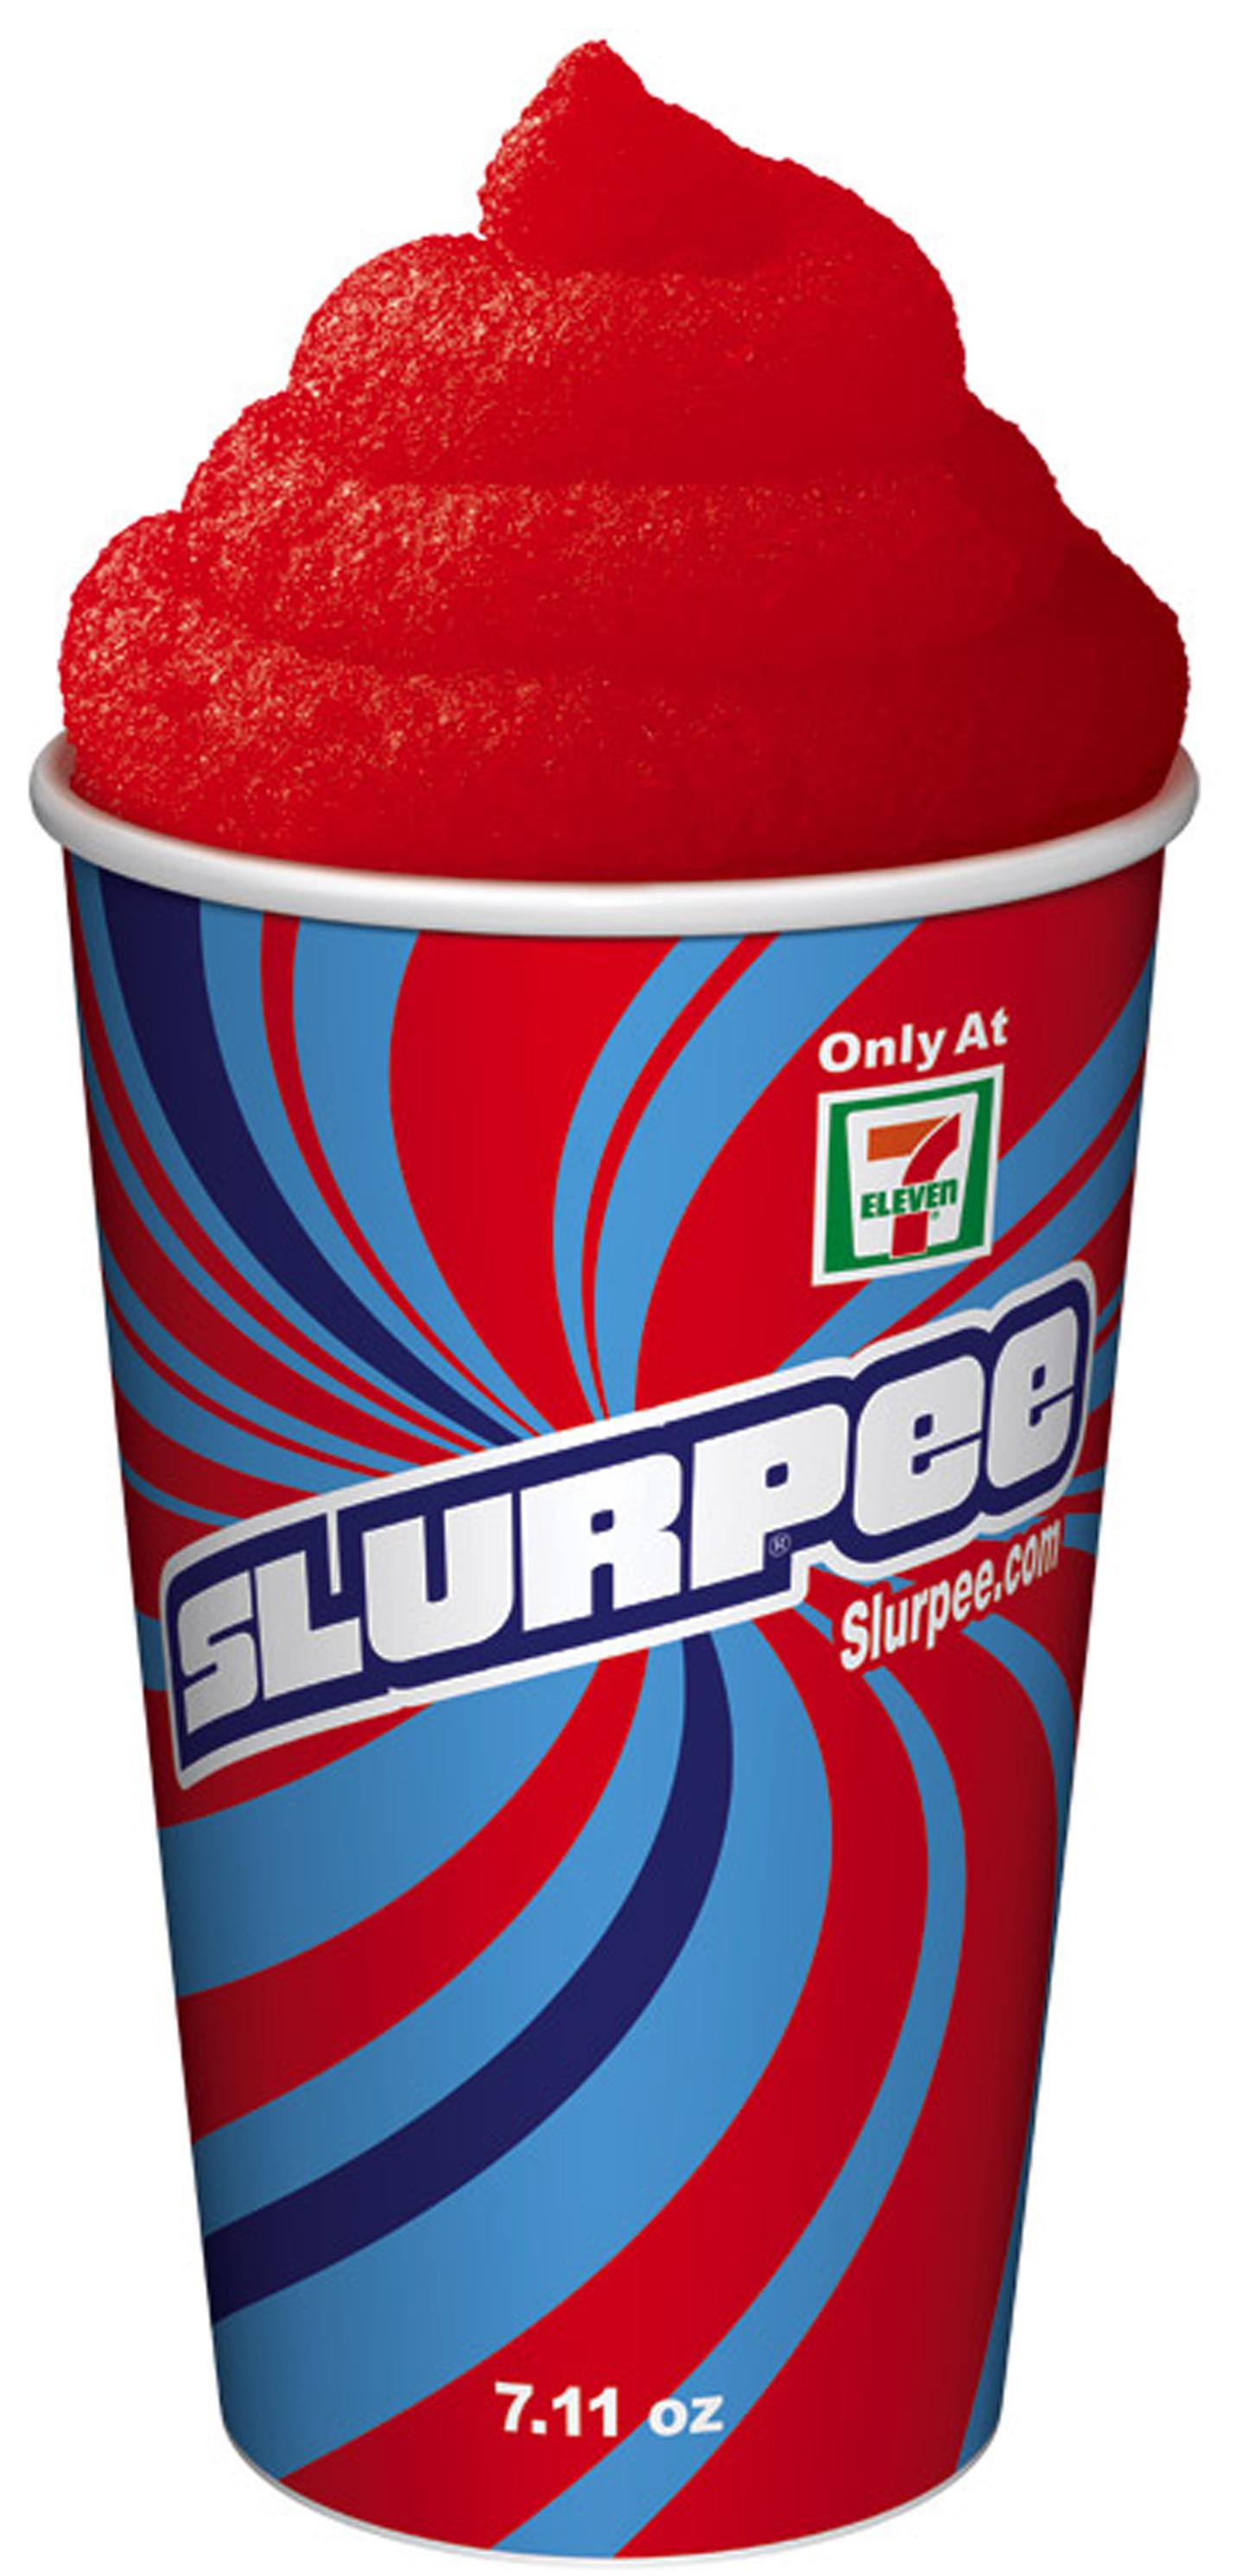 Picture of Homemade Slurpee (frozen Deliciousness)